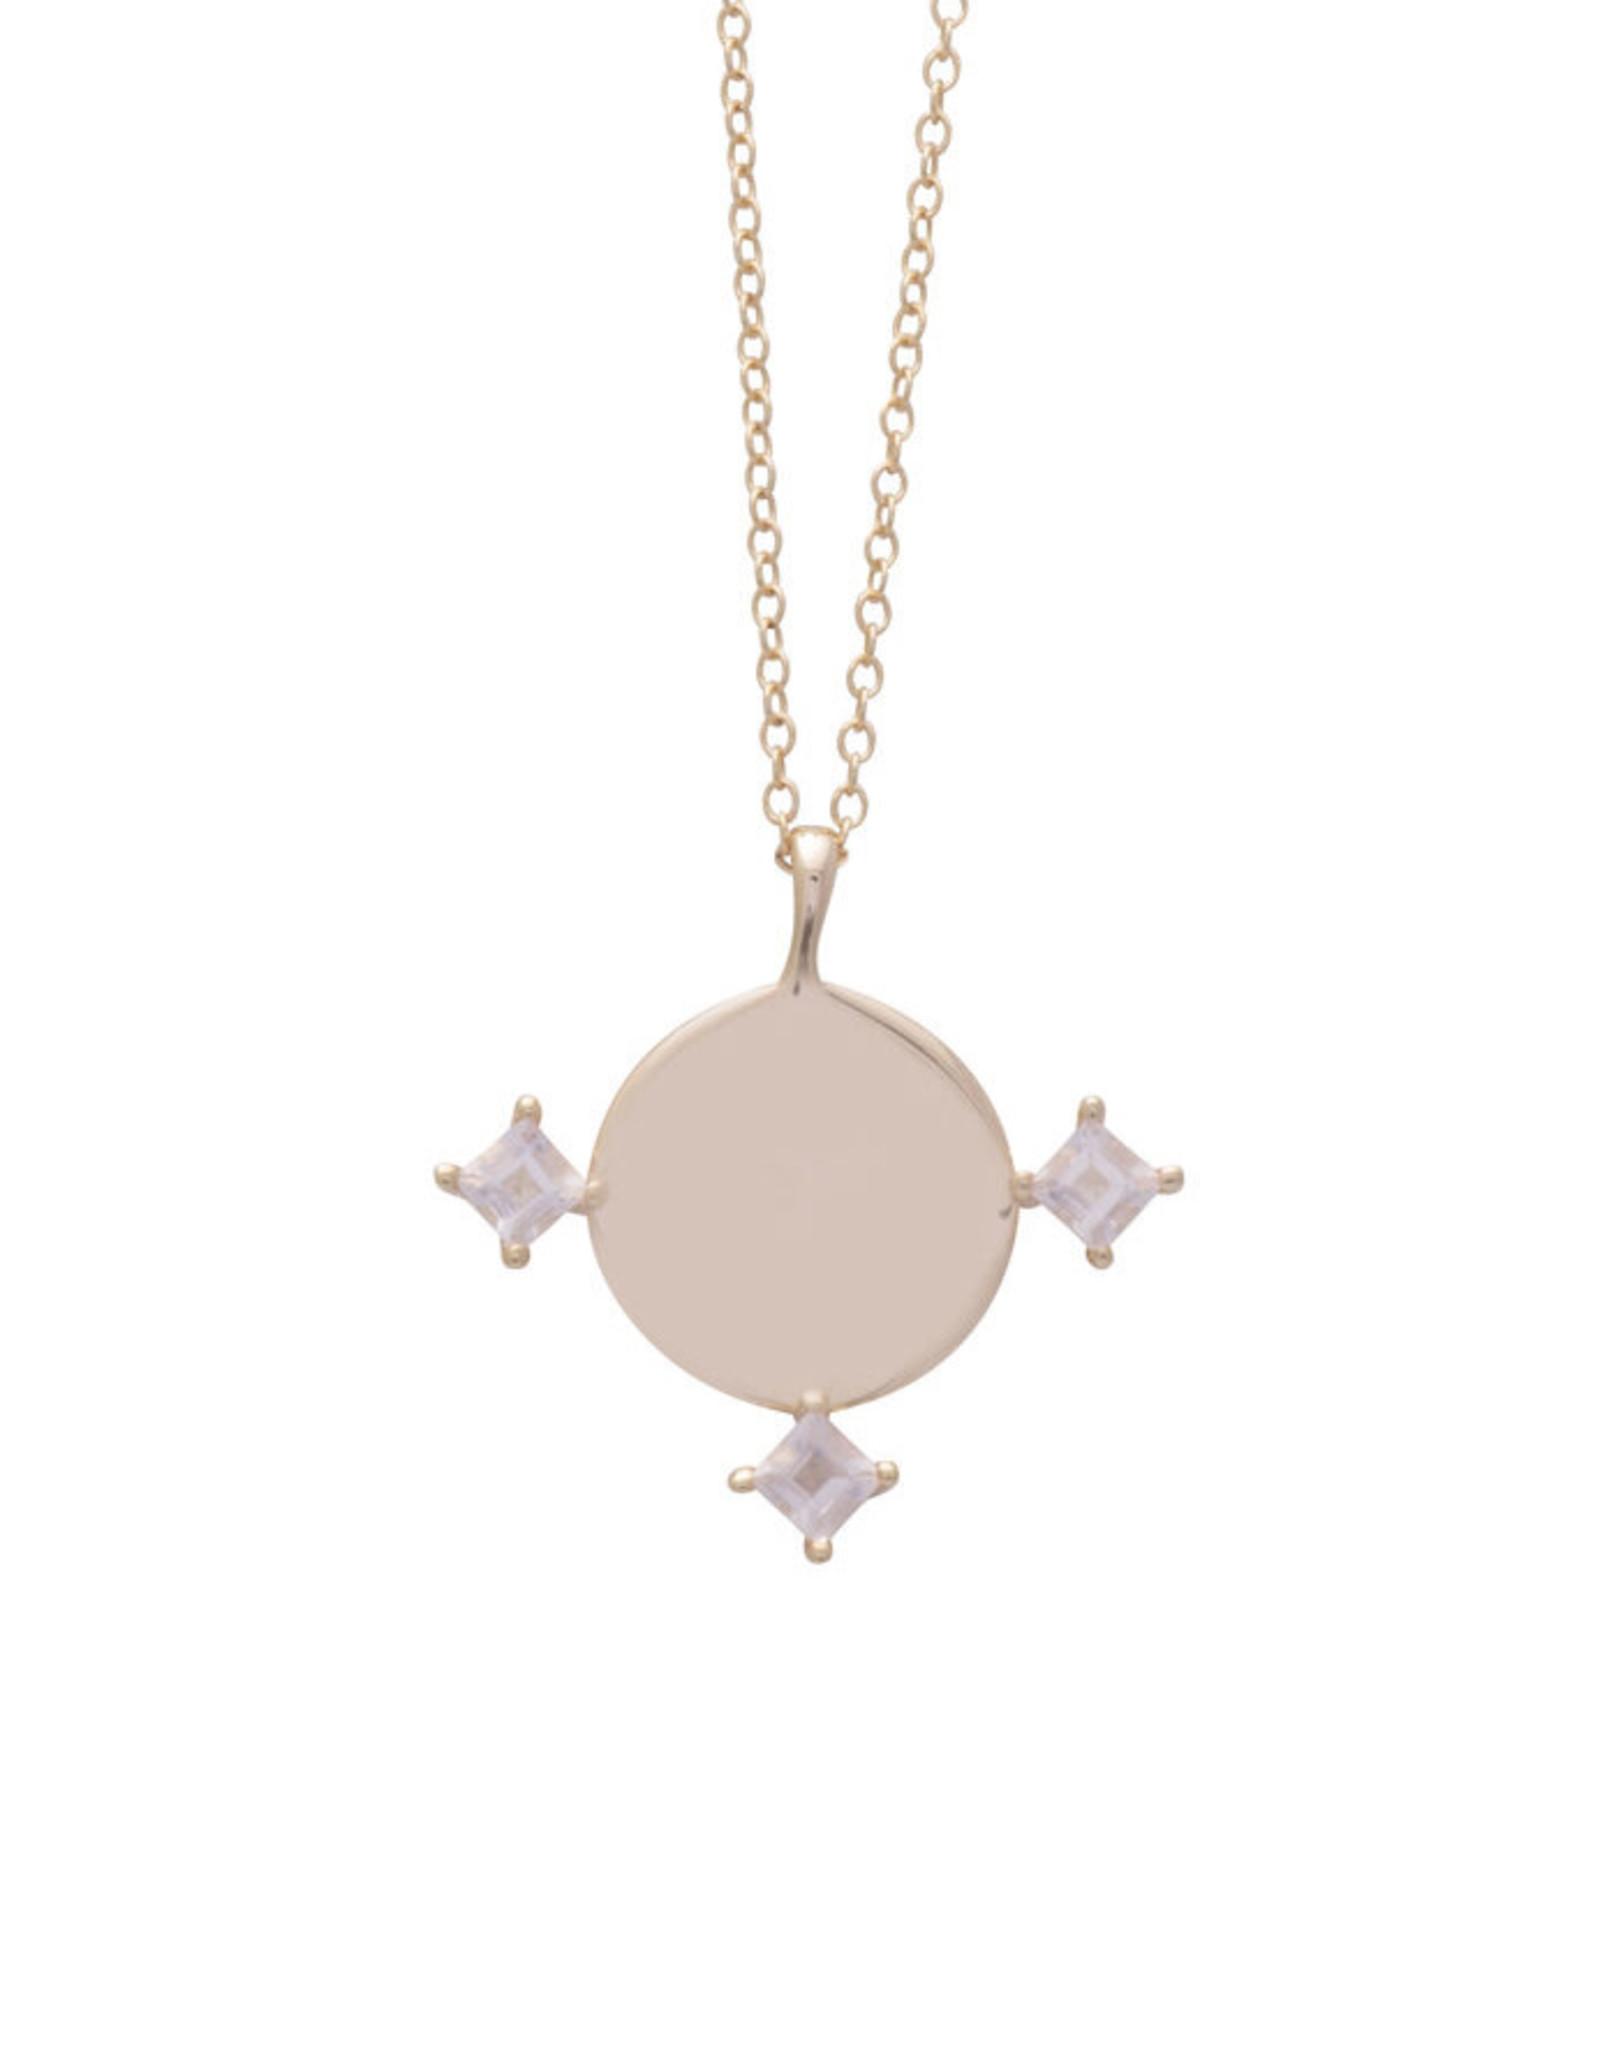 Sarah Mulder Jewelry Gold Imperial Necklace - Rose Quartz